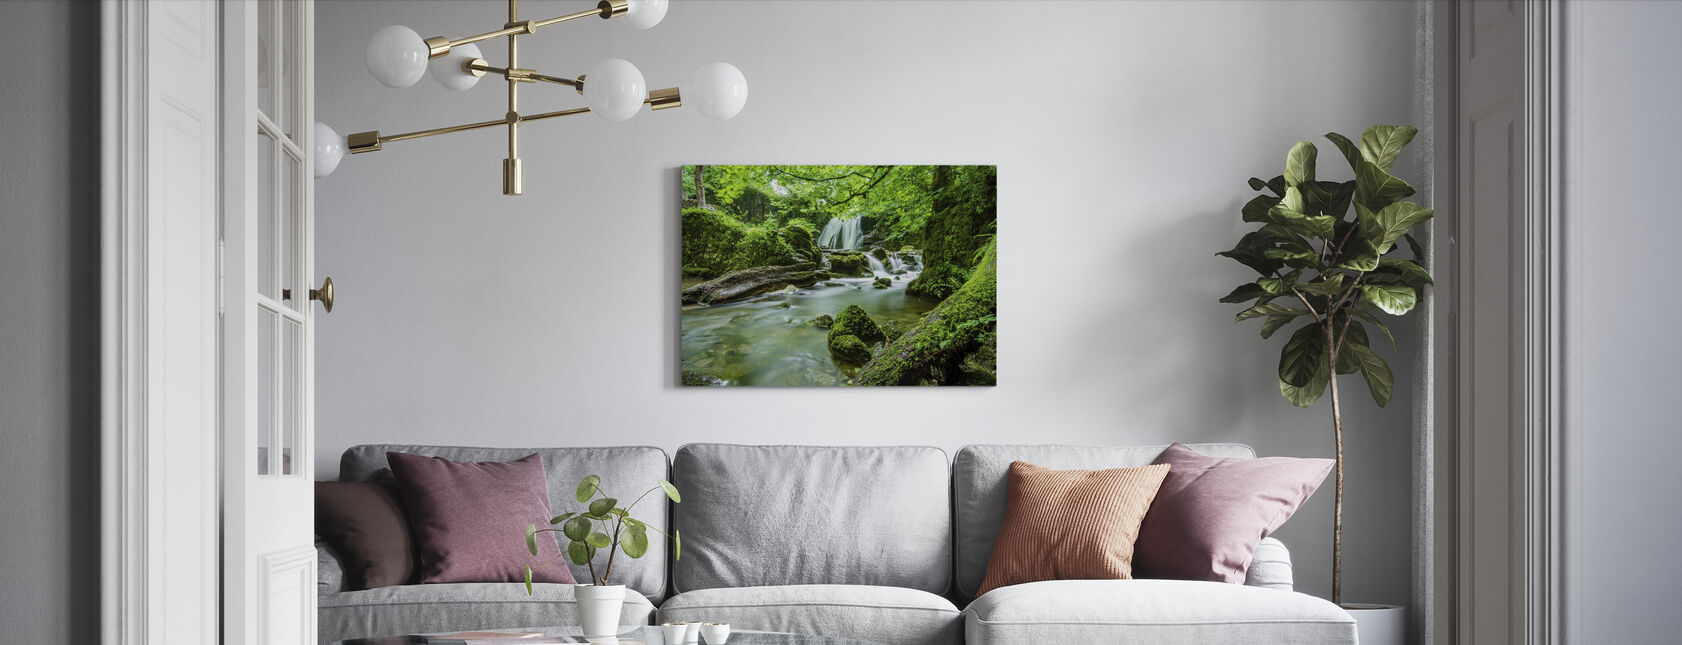 Waterfall Stream - Canvas print - Living Room